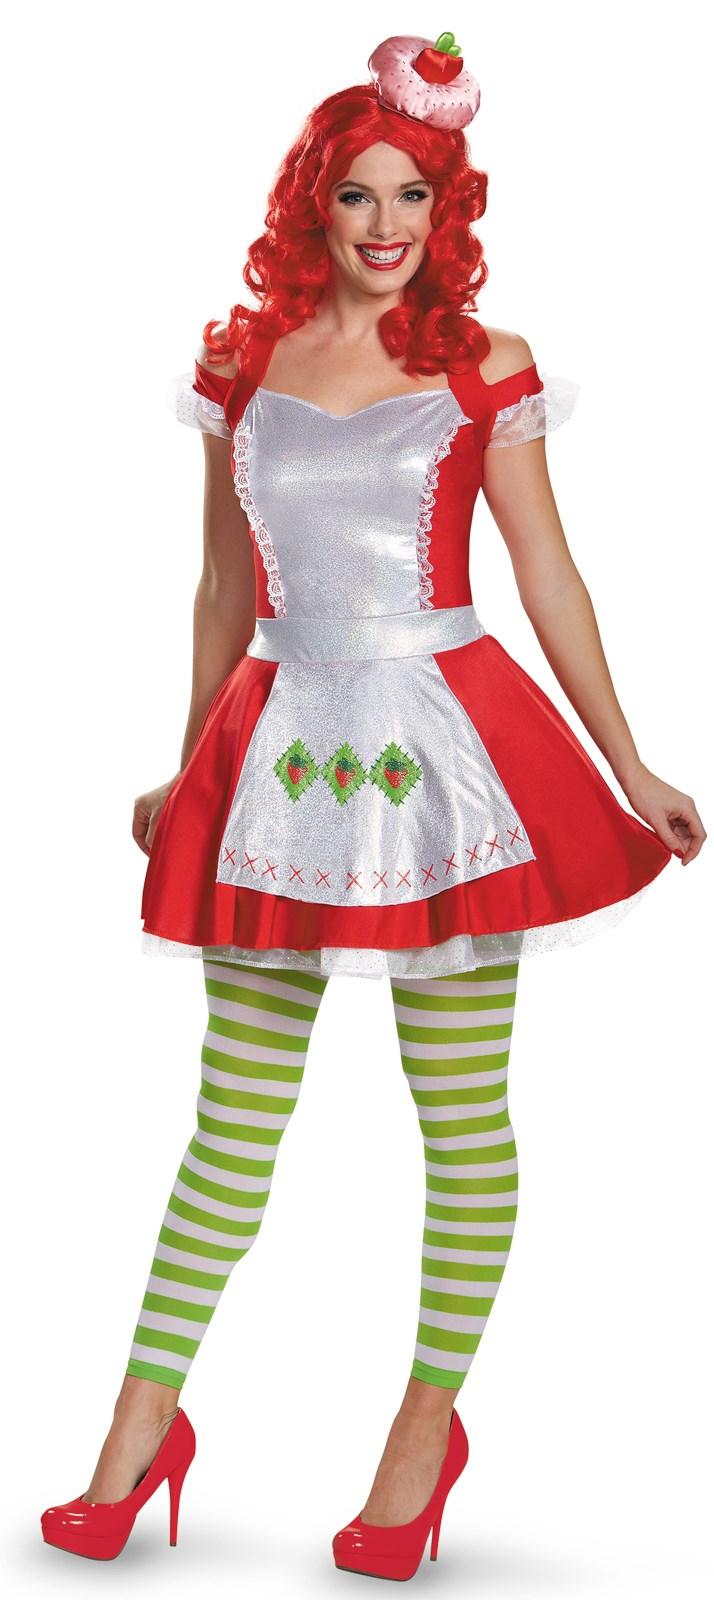 Strawberry Shortcake Costume For Women